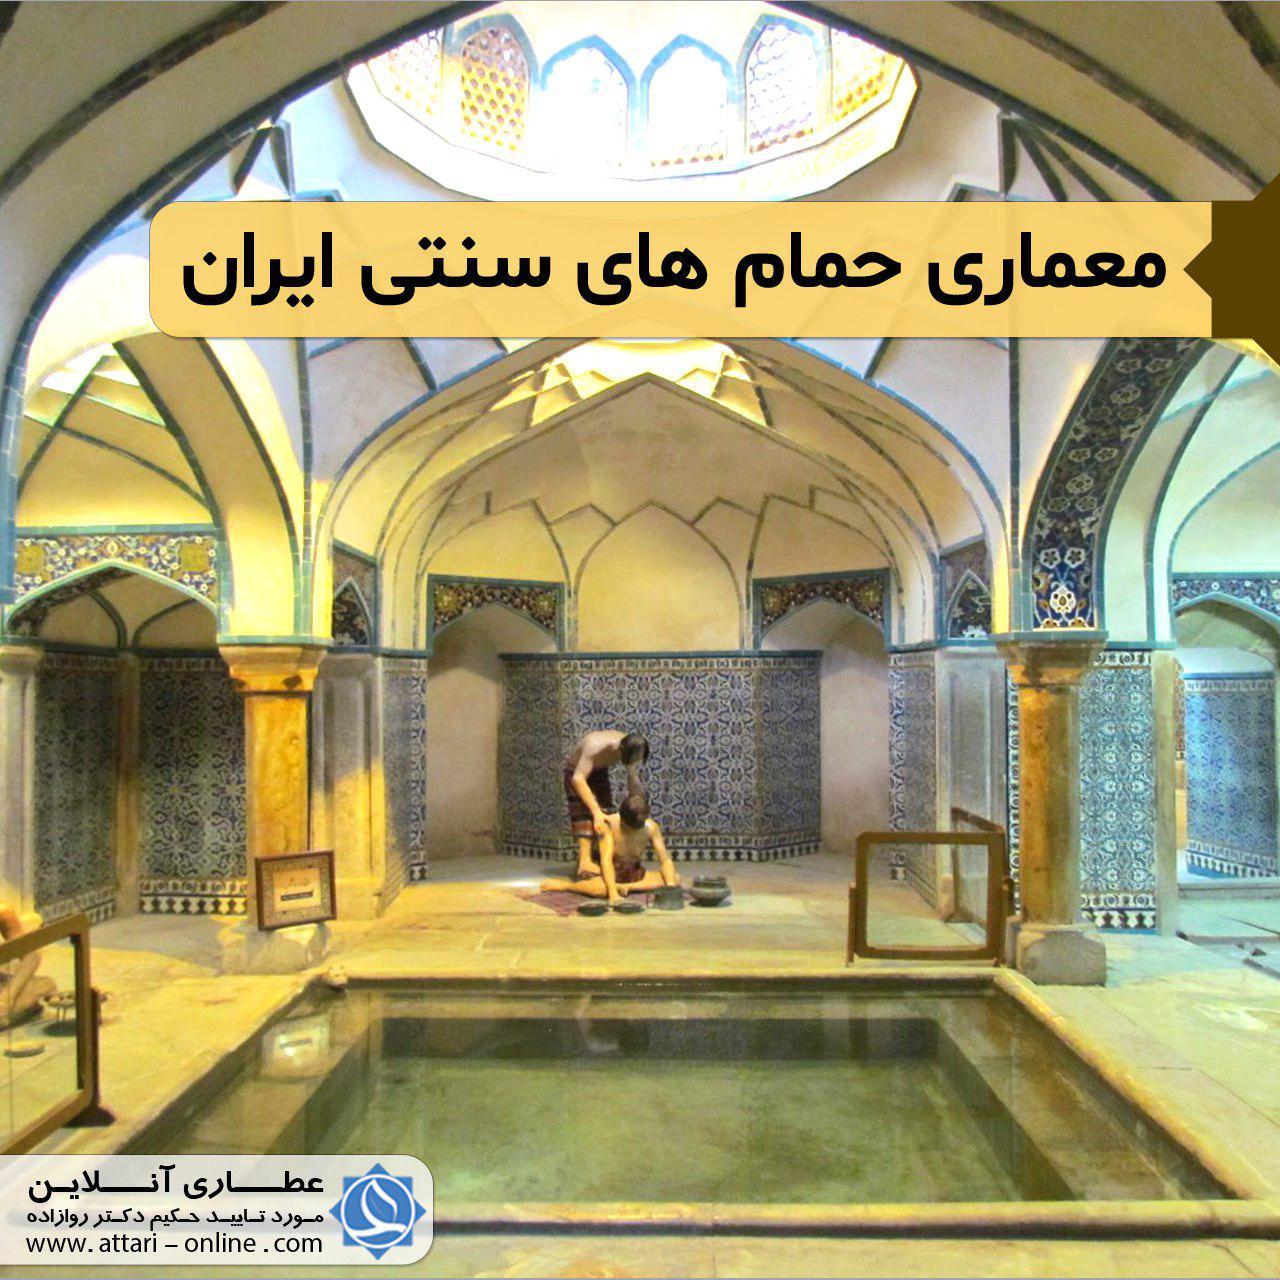 photo 2018 09 02 10 53 25 معماری حمام های سنتی ایران